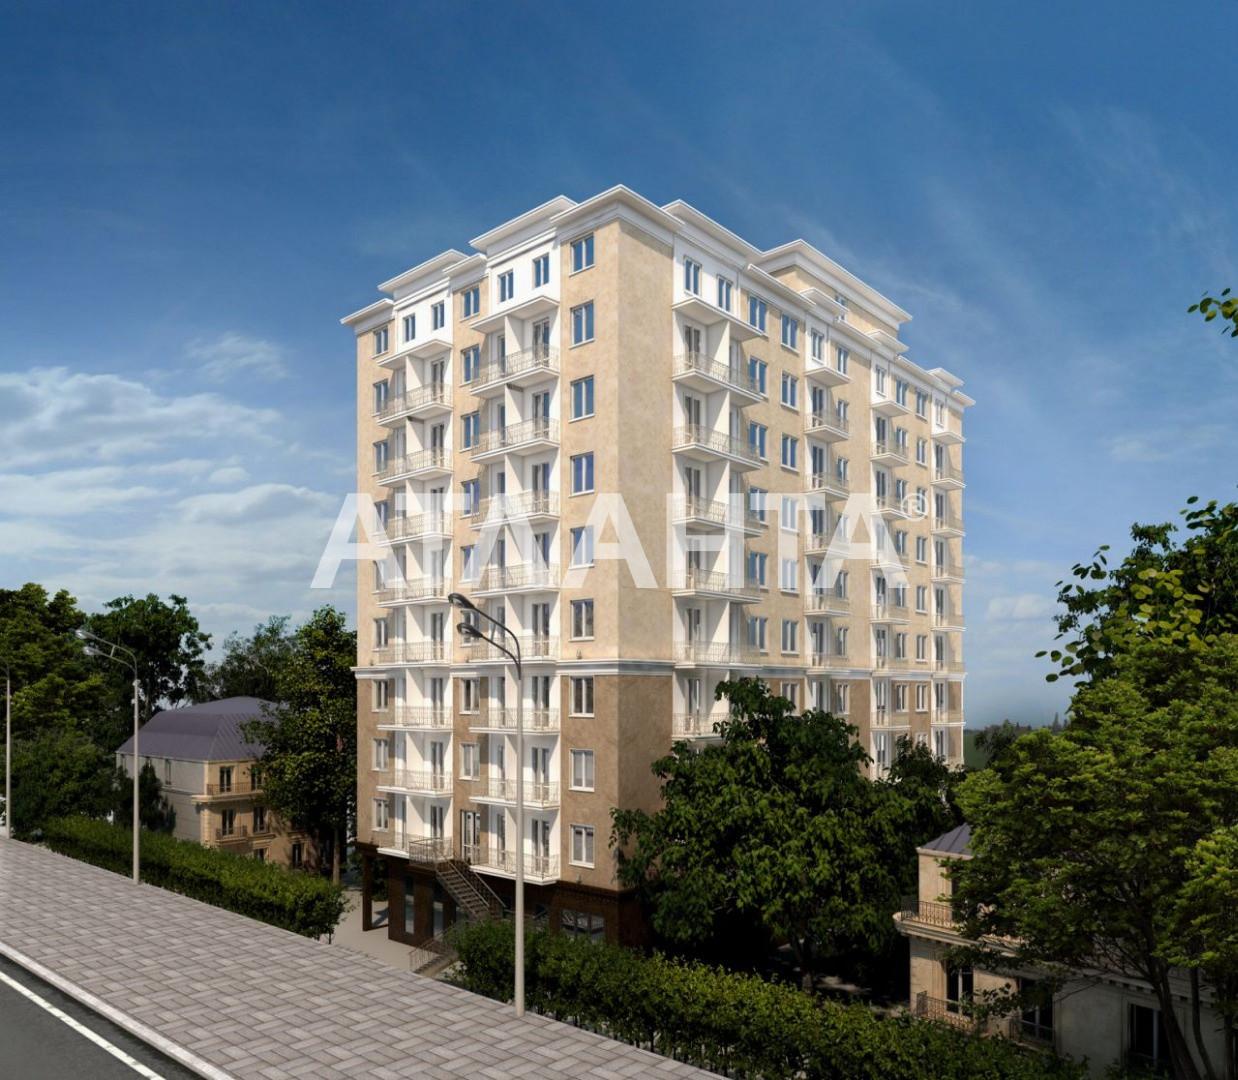 Продается 1-комнатная Квартира на ул. Балковская (Фрунзе) — 26 520 у.е. (фото №2)